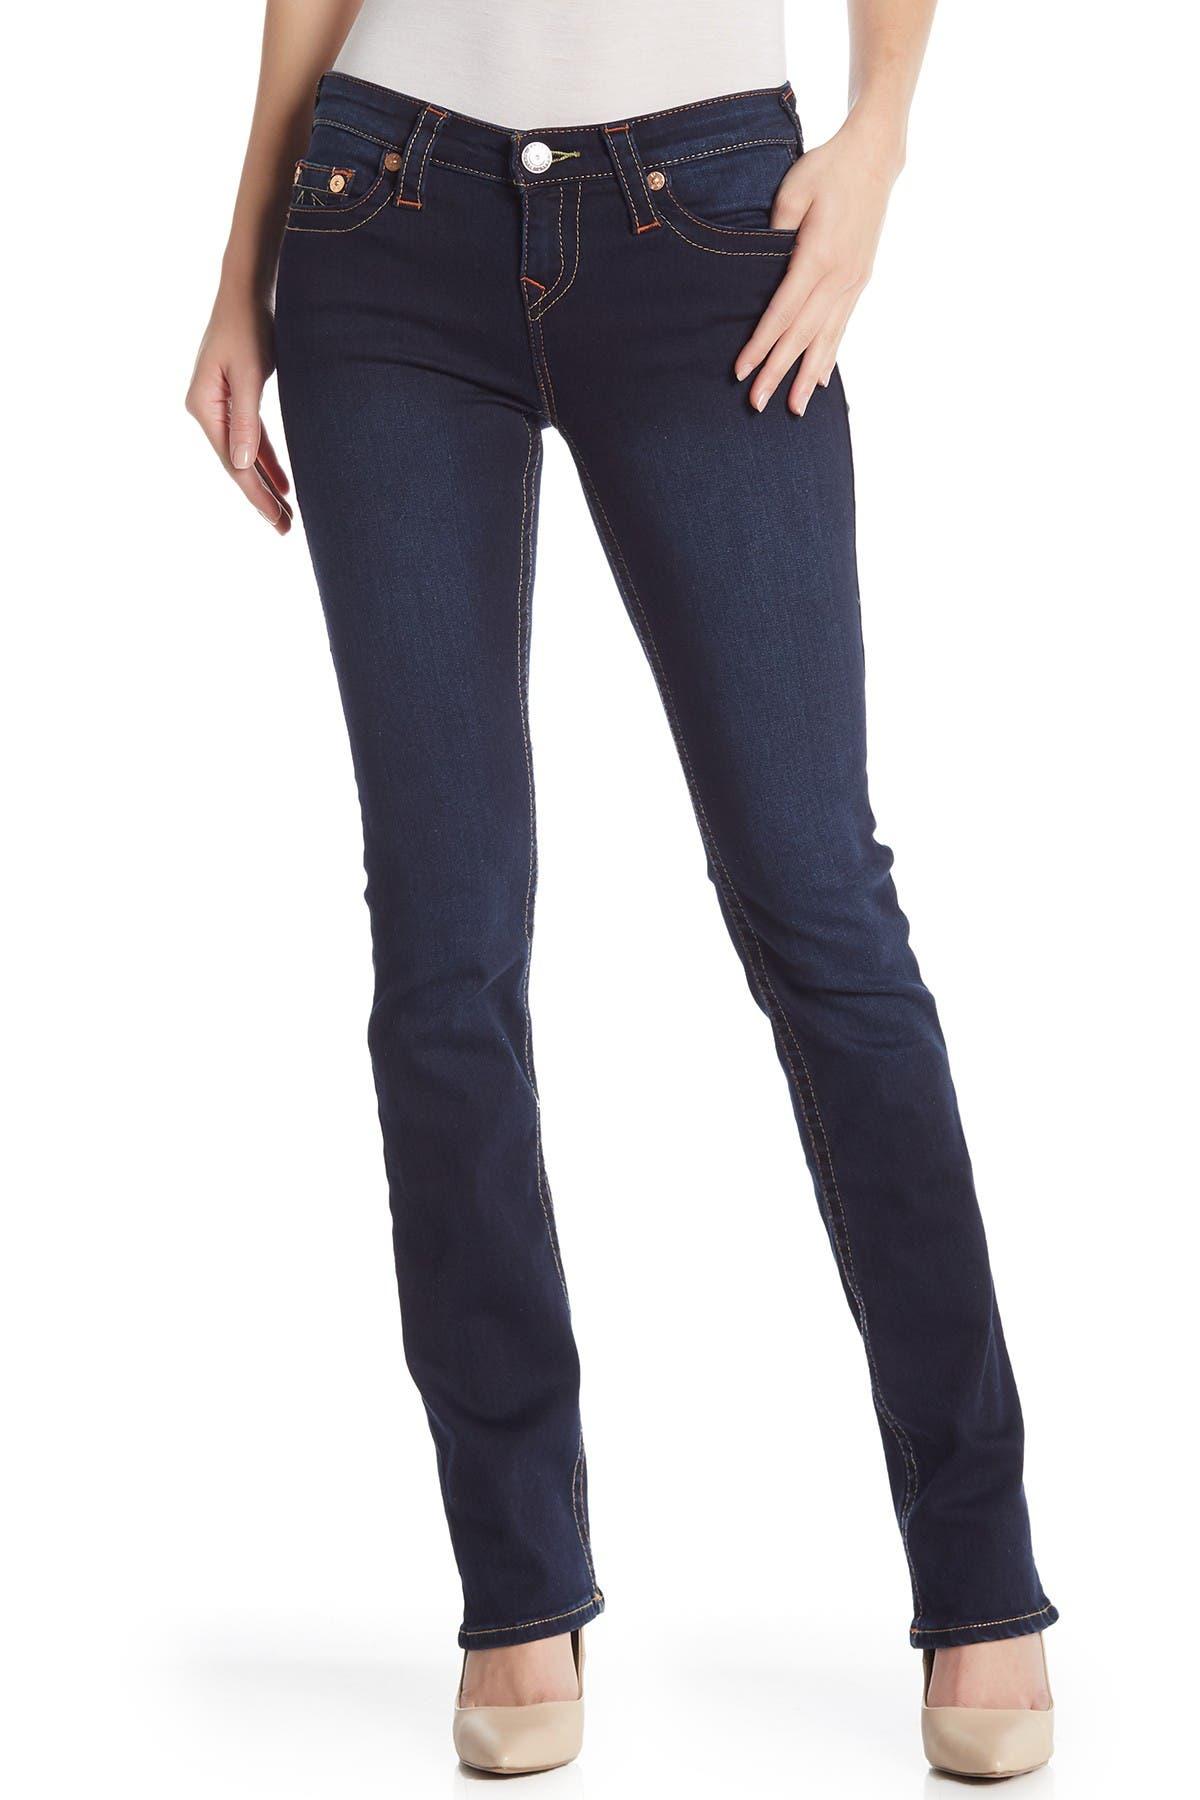 Image of True Religion Bille Mid Rise Straight Leg Jeans